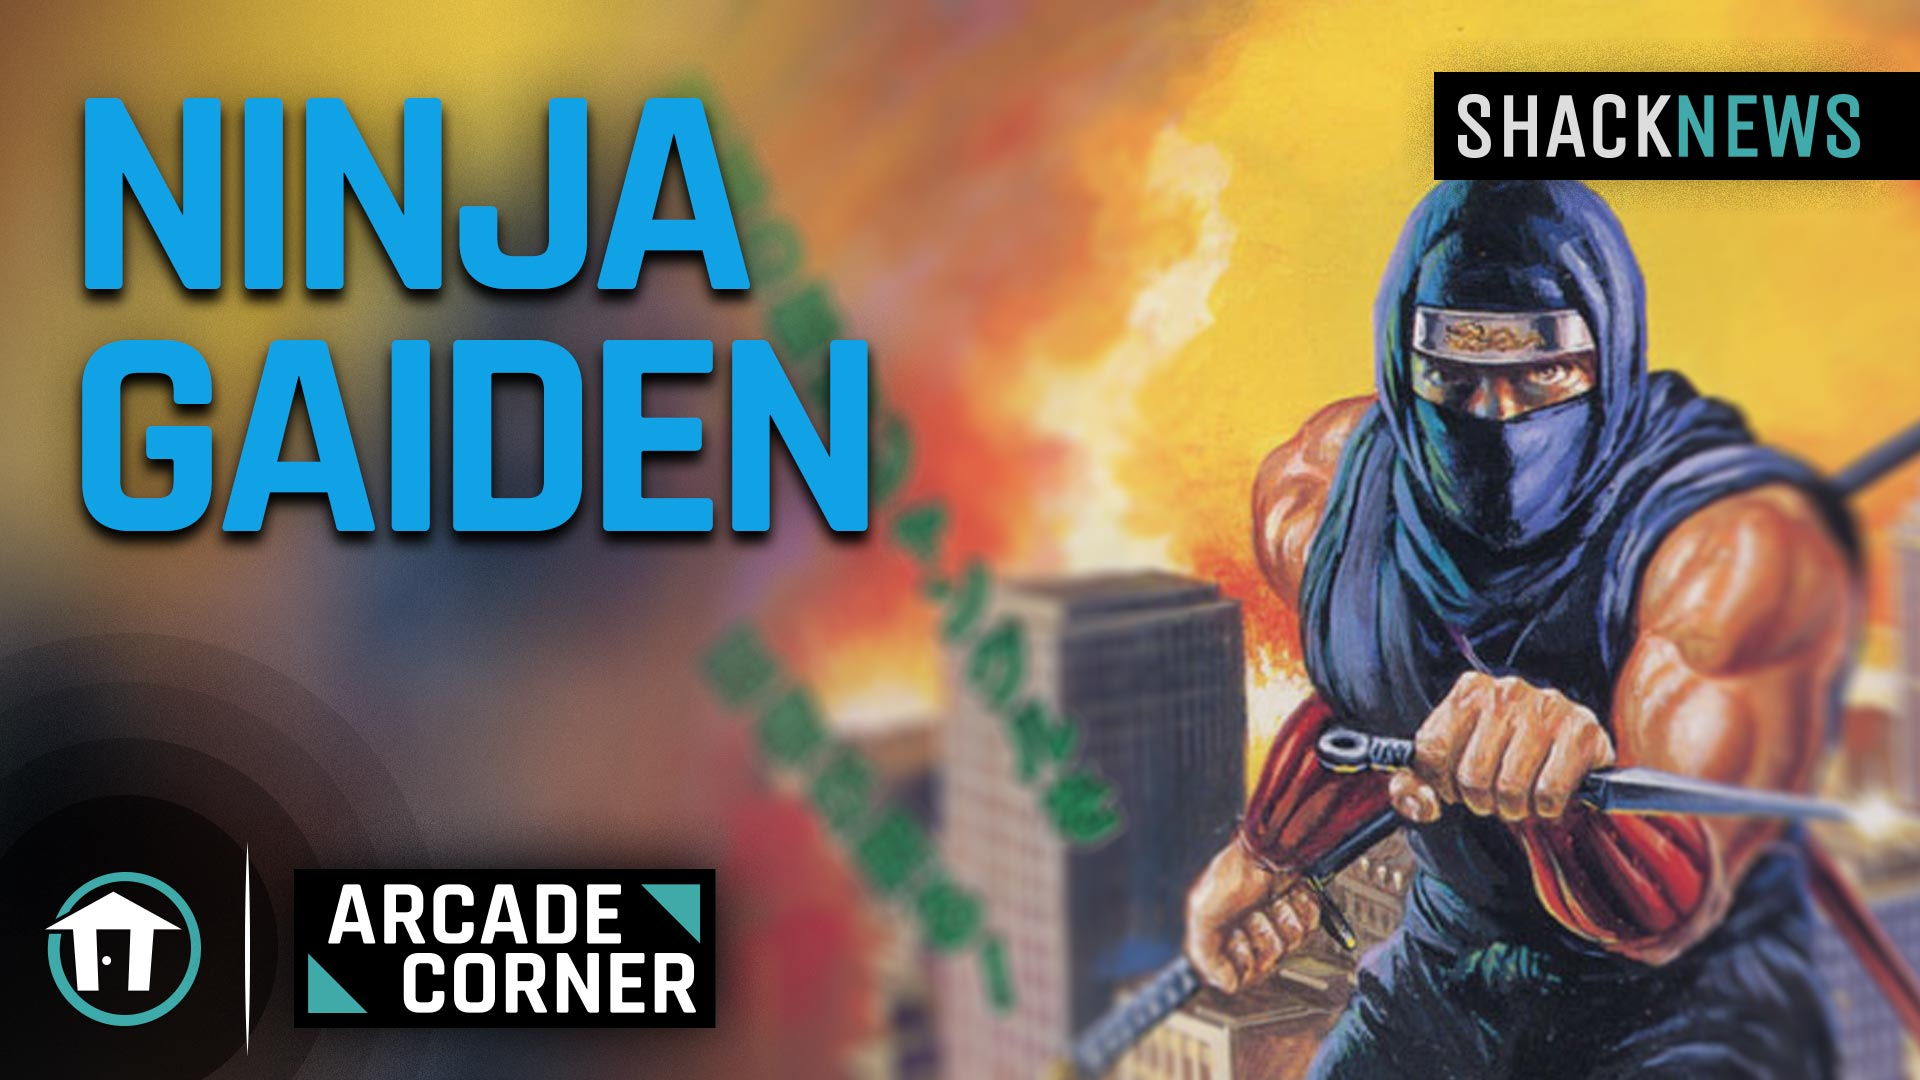 Shack S Arcade Corner Ninja Gaiden Shacknews